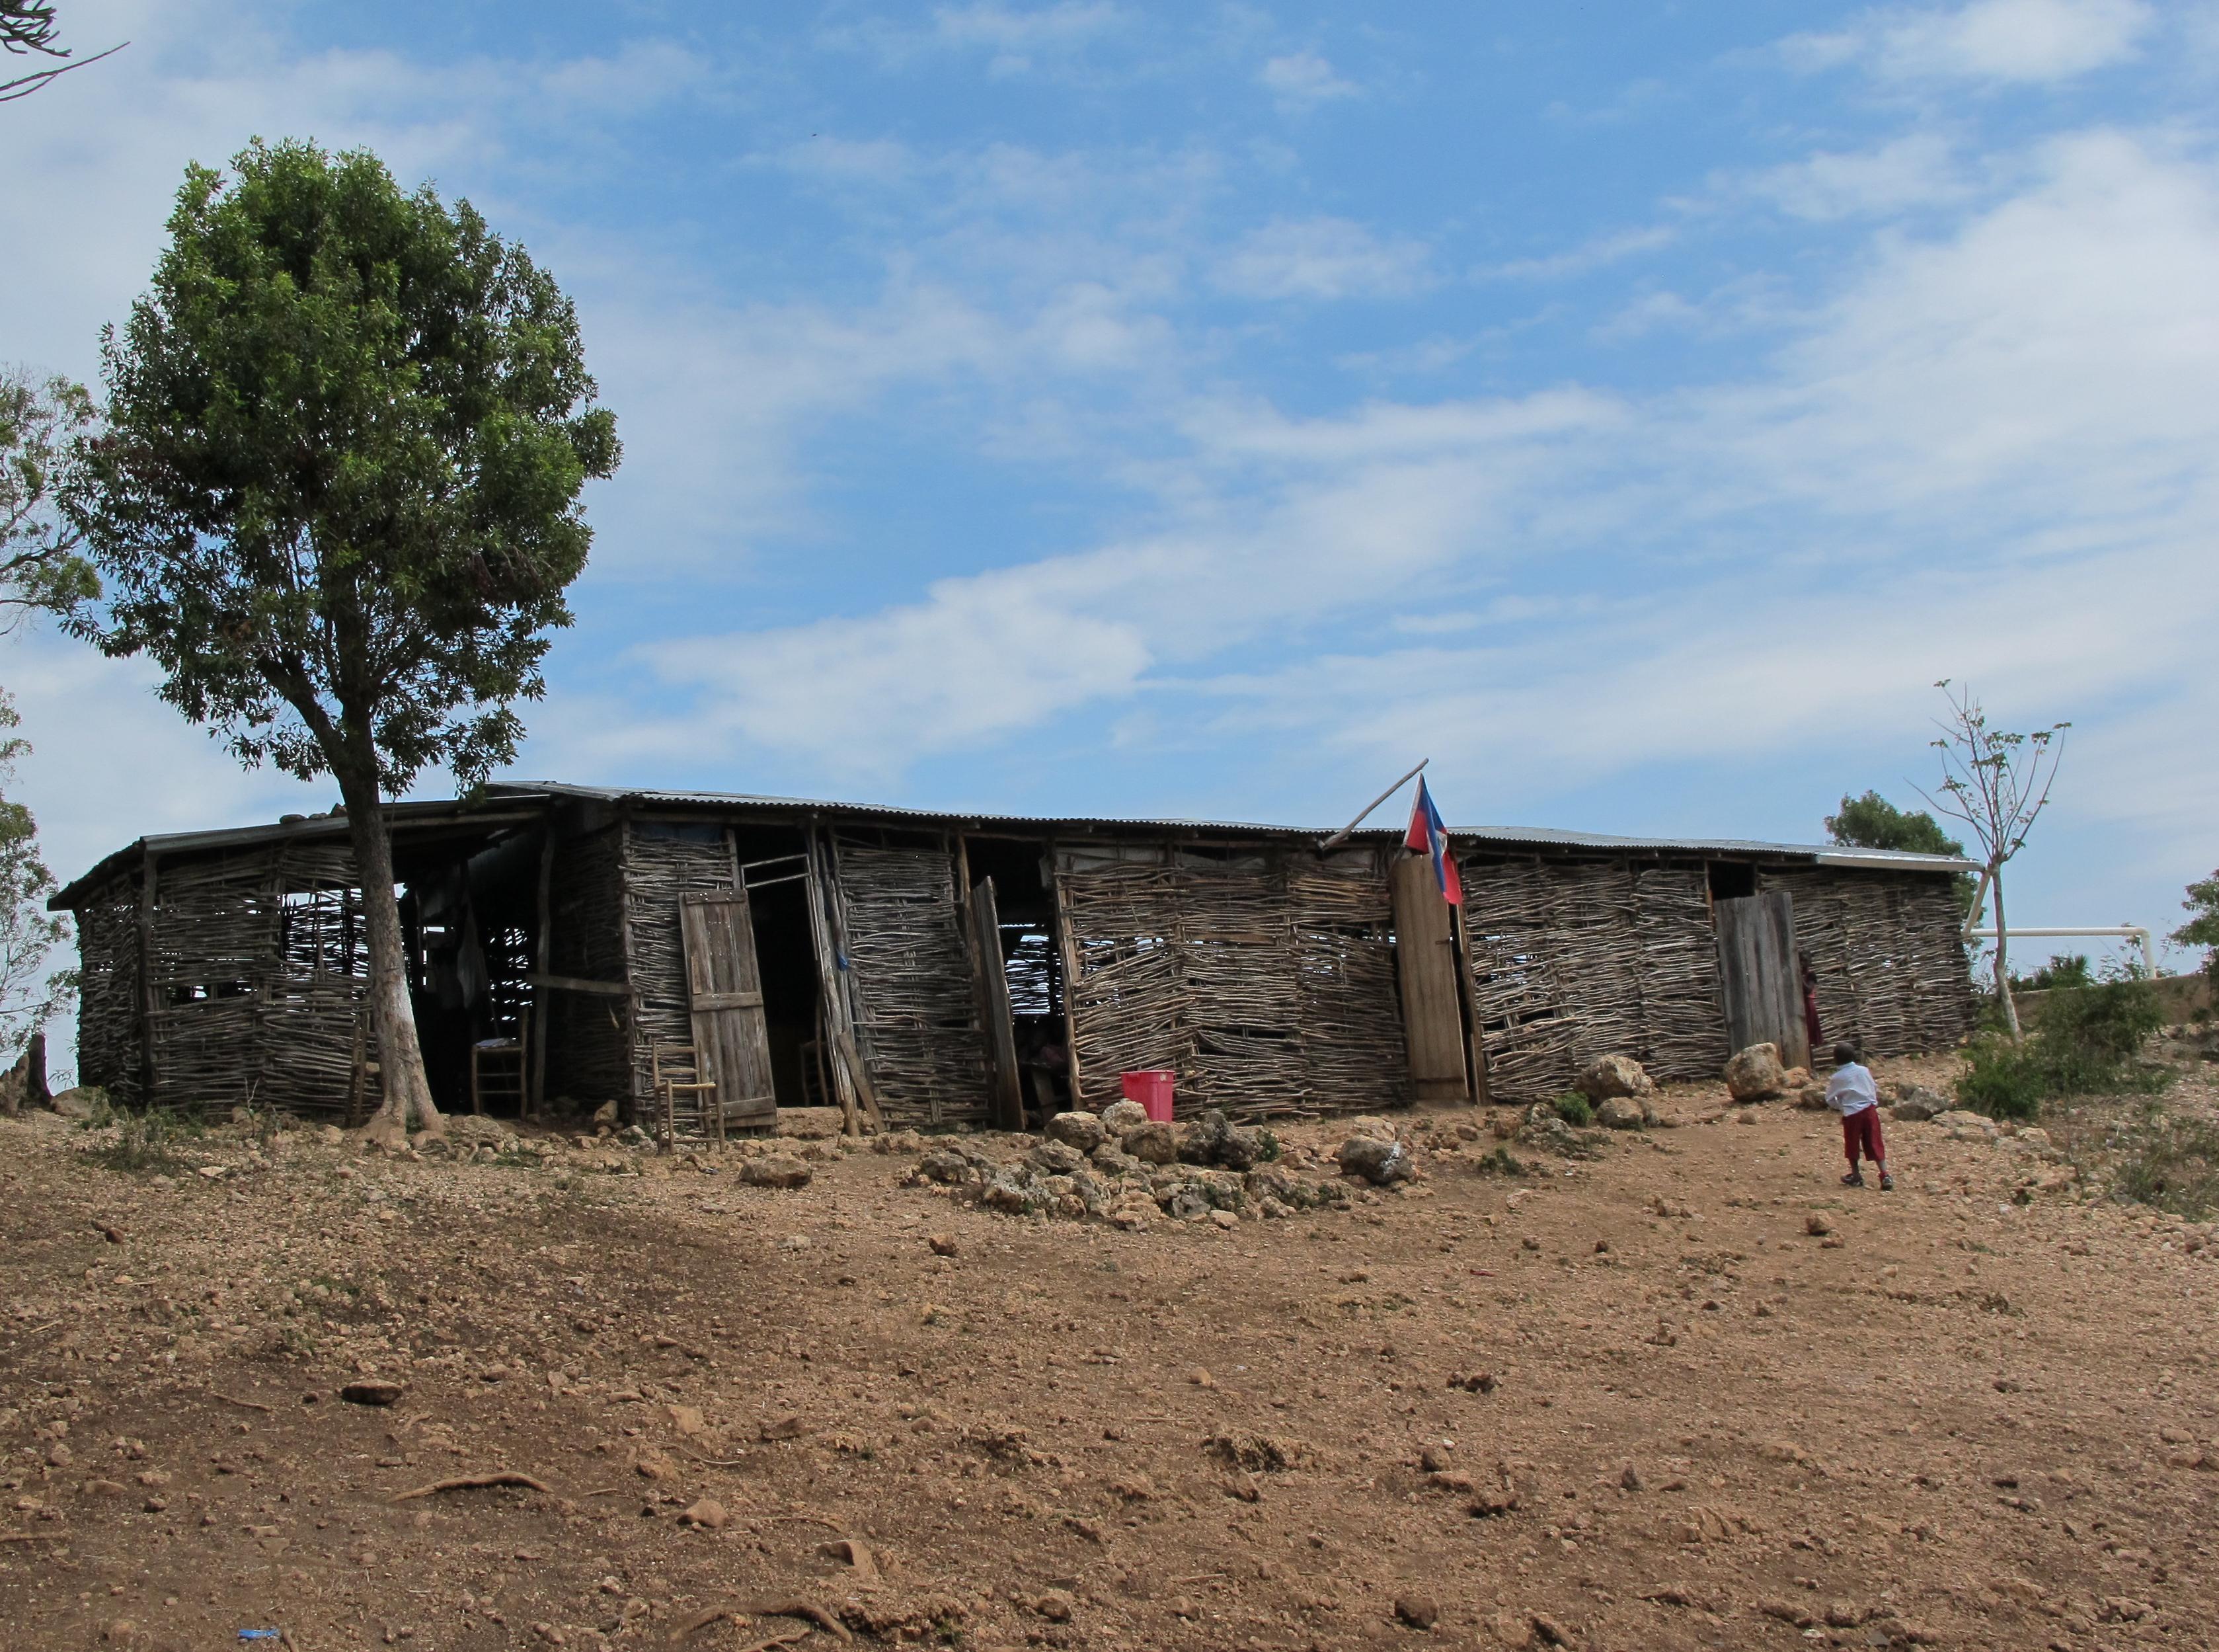 The school at Pelerin.